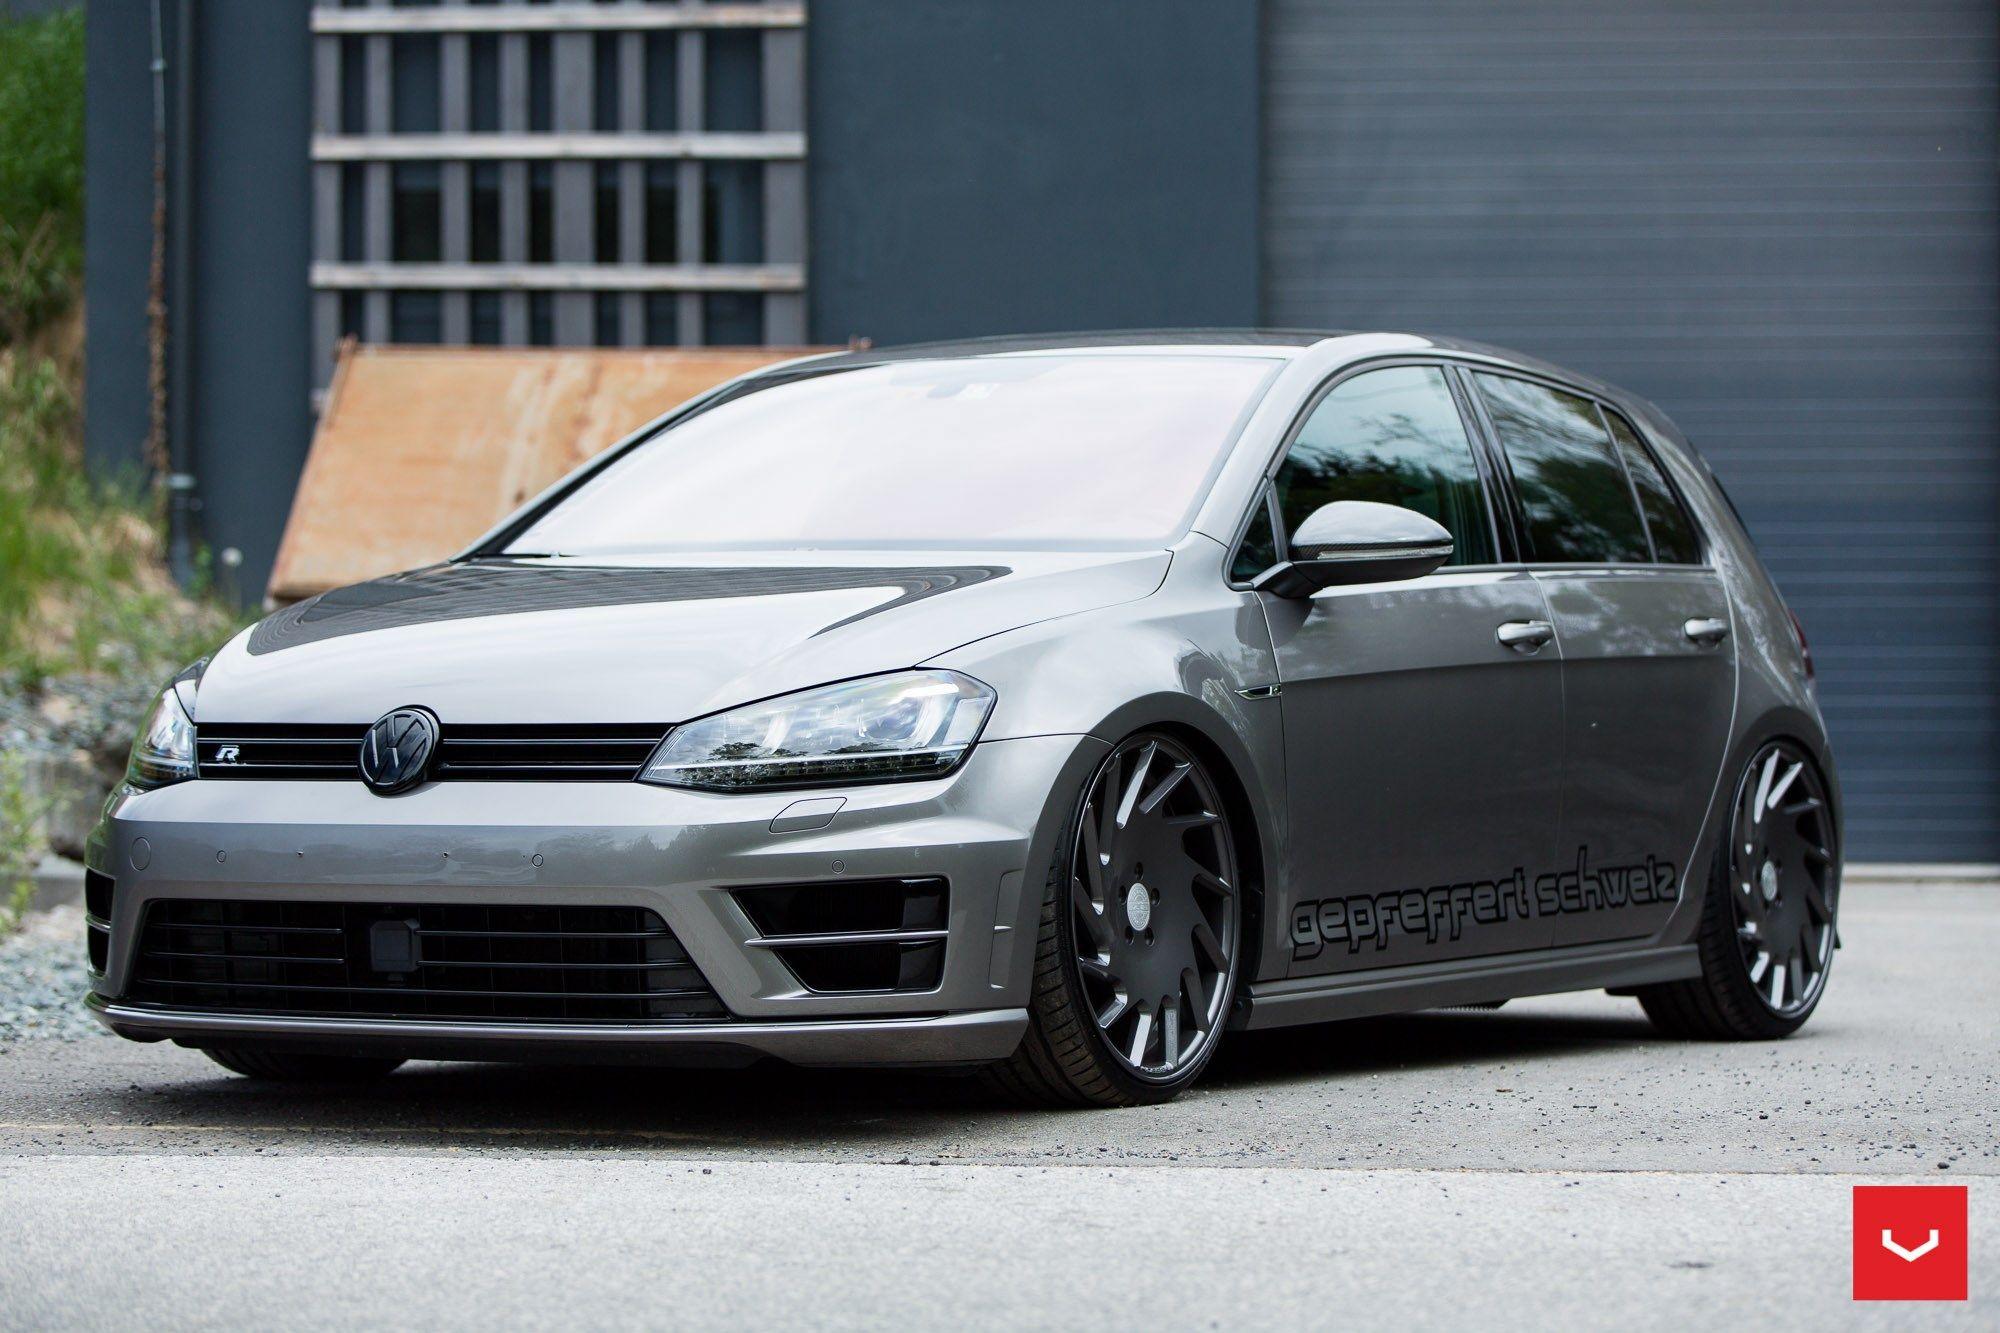 Vw Golf R Vossen Vle1 Vw Golf Car Volkswagen Vw Golf Vr6